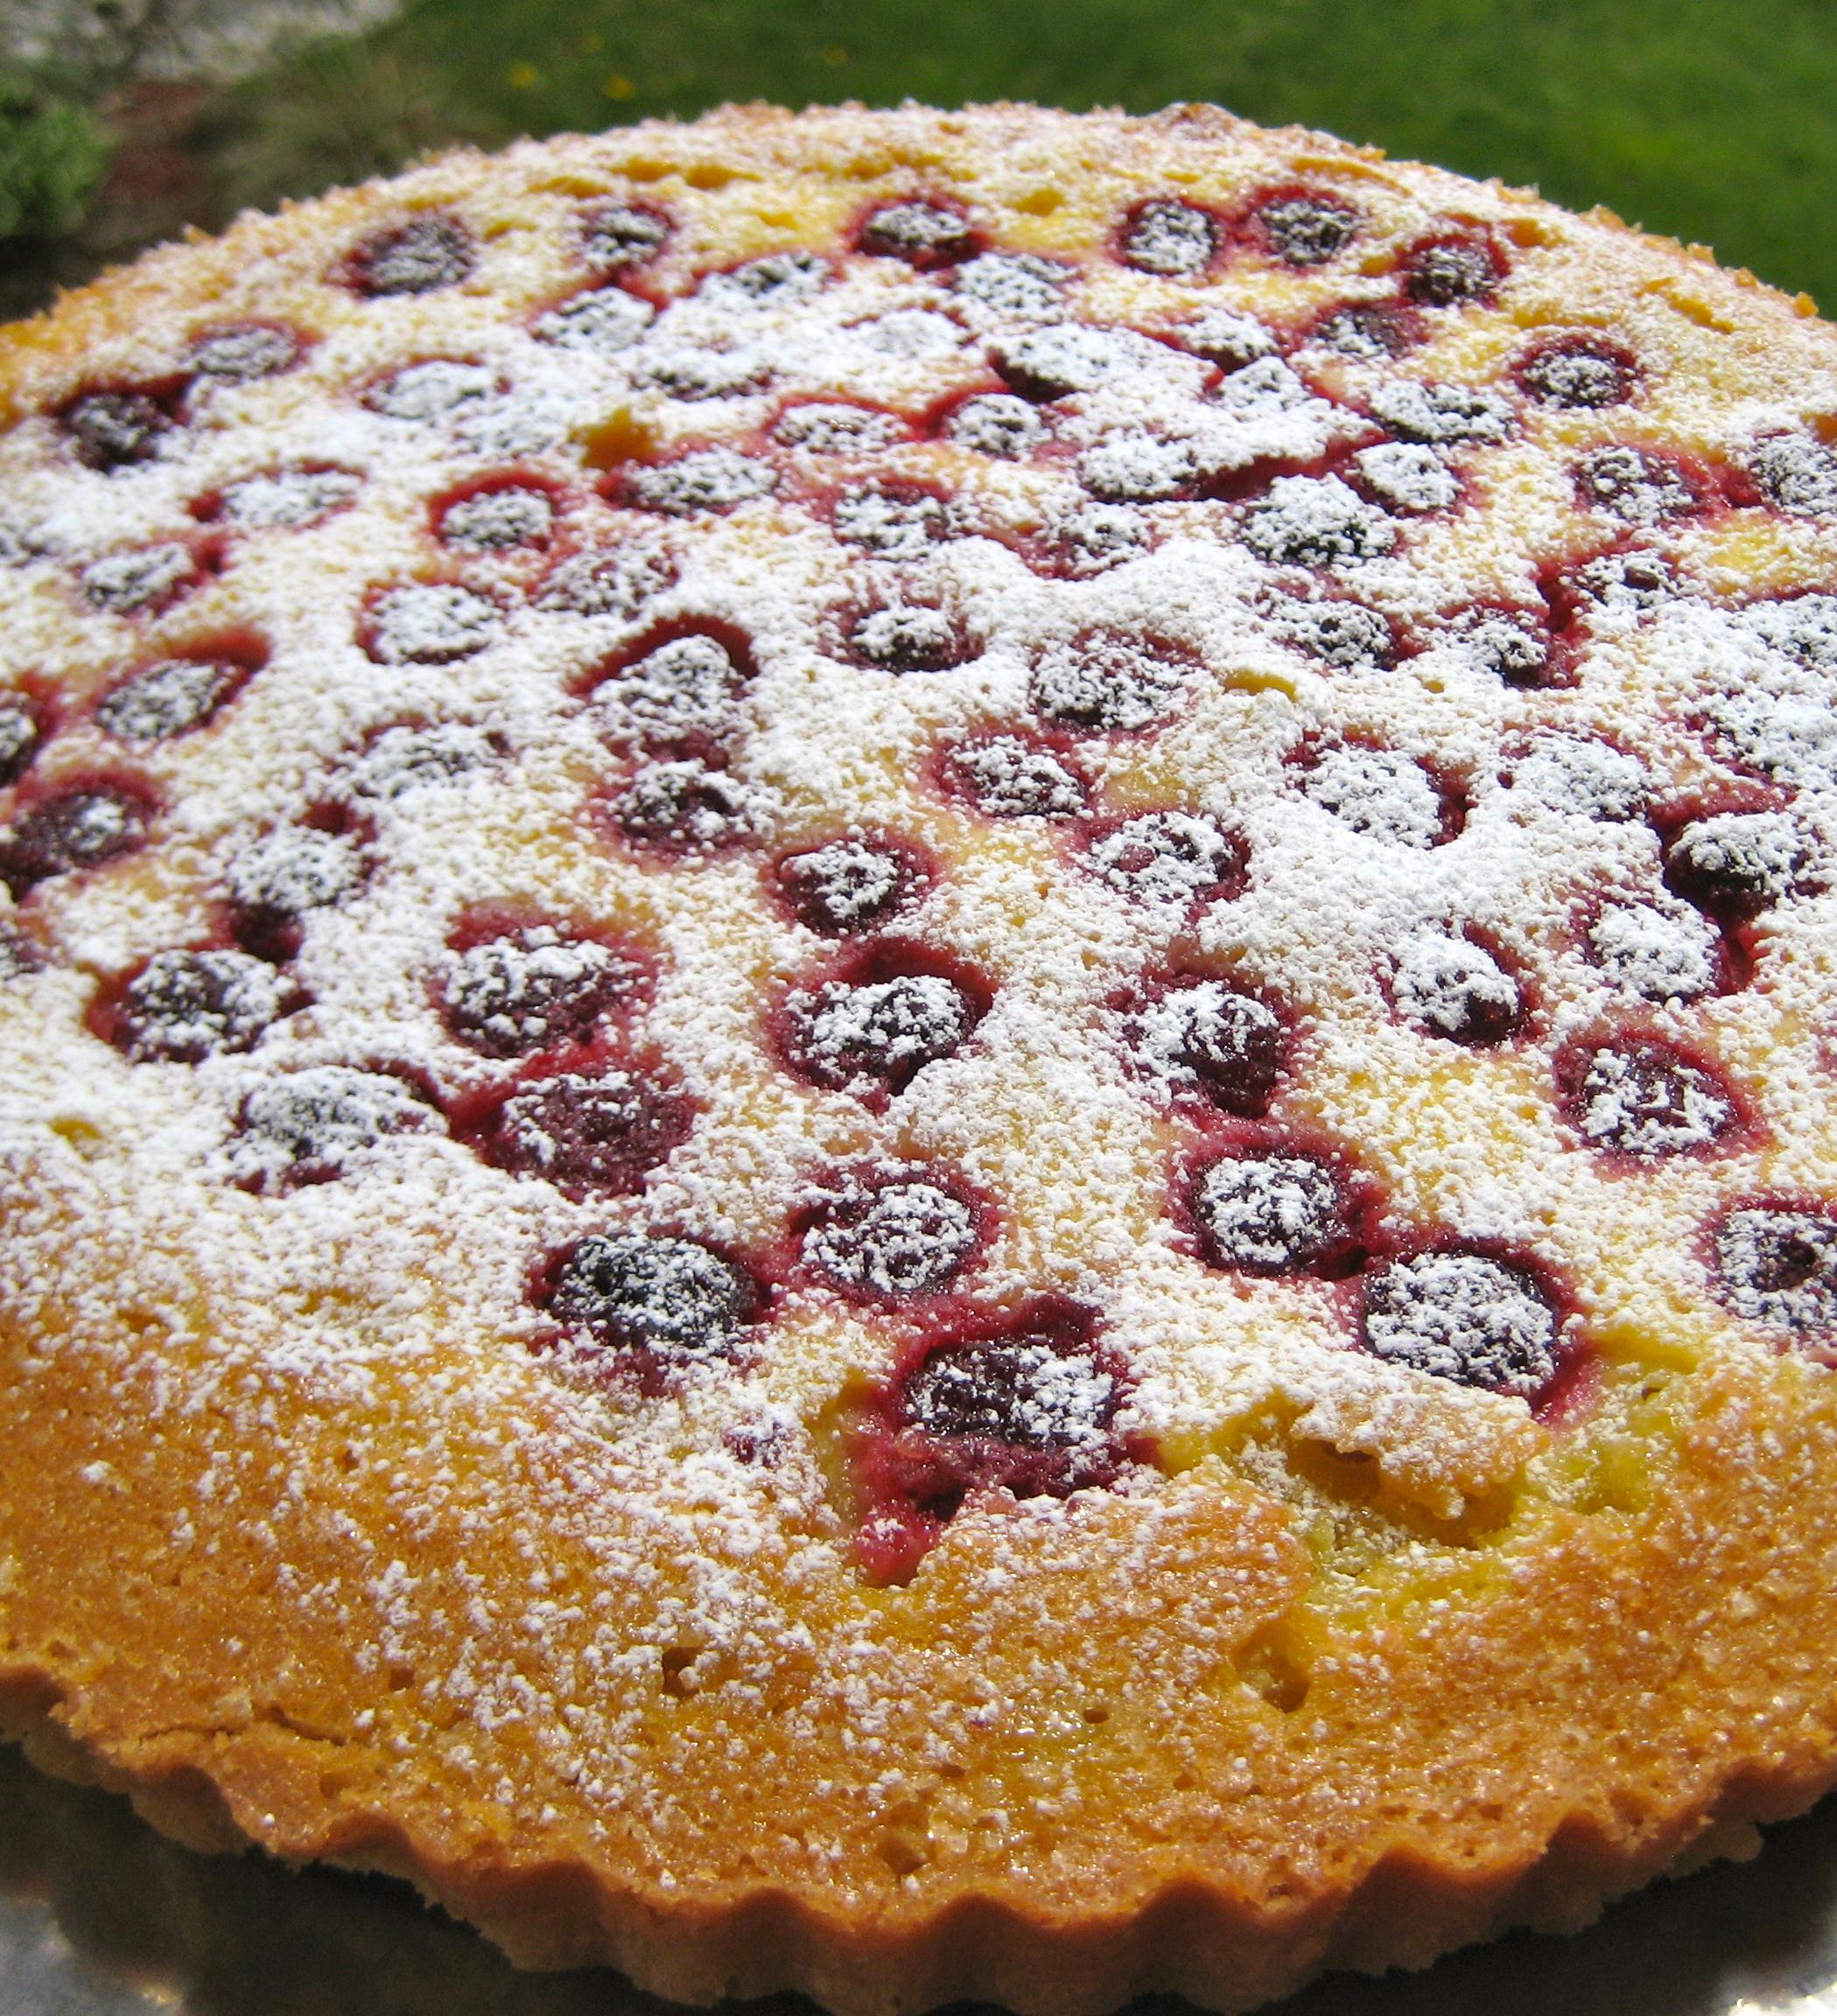 ... Sings Spring Raspberry-Crème Fraîche Tart – Urban Cottage Life